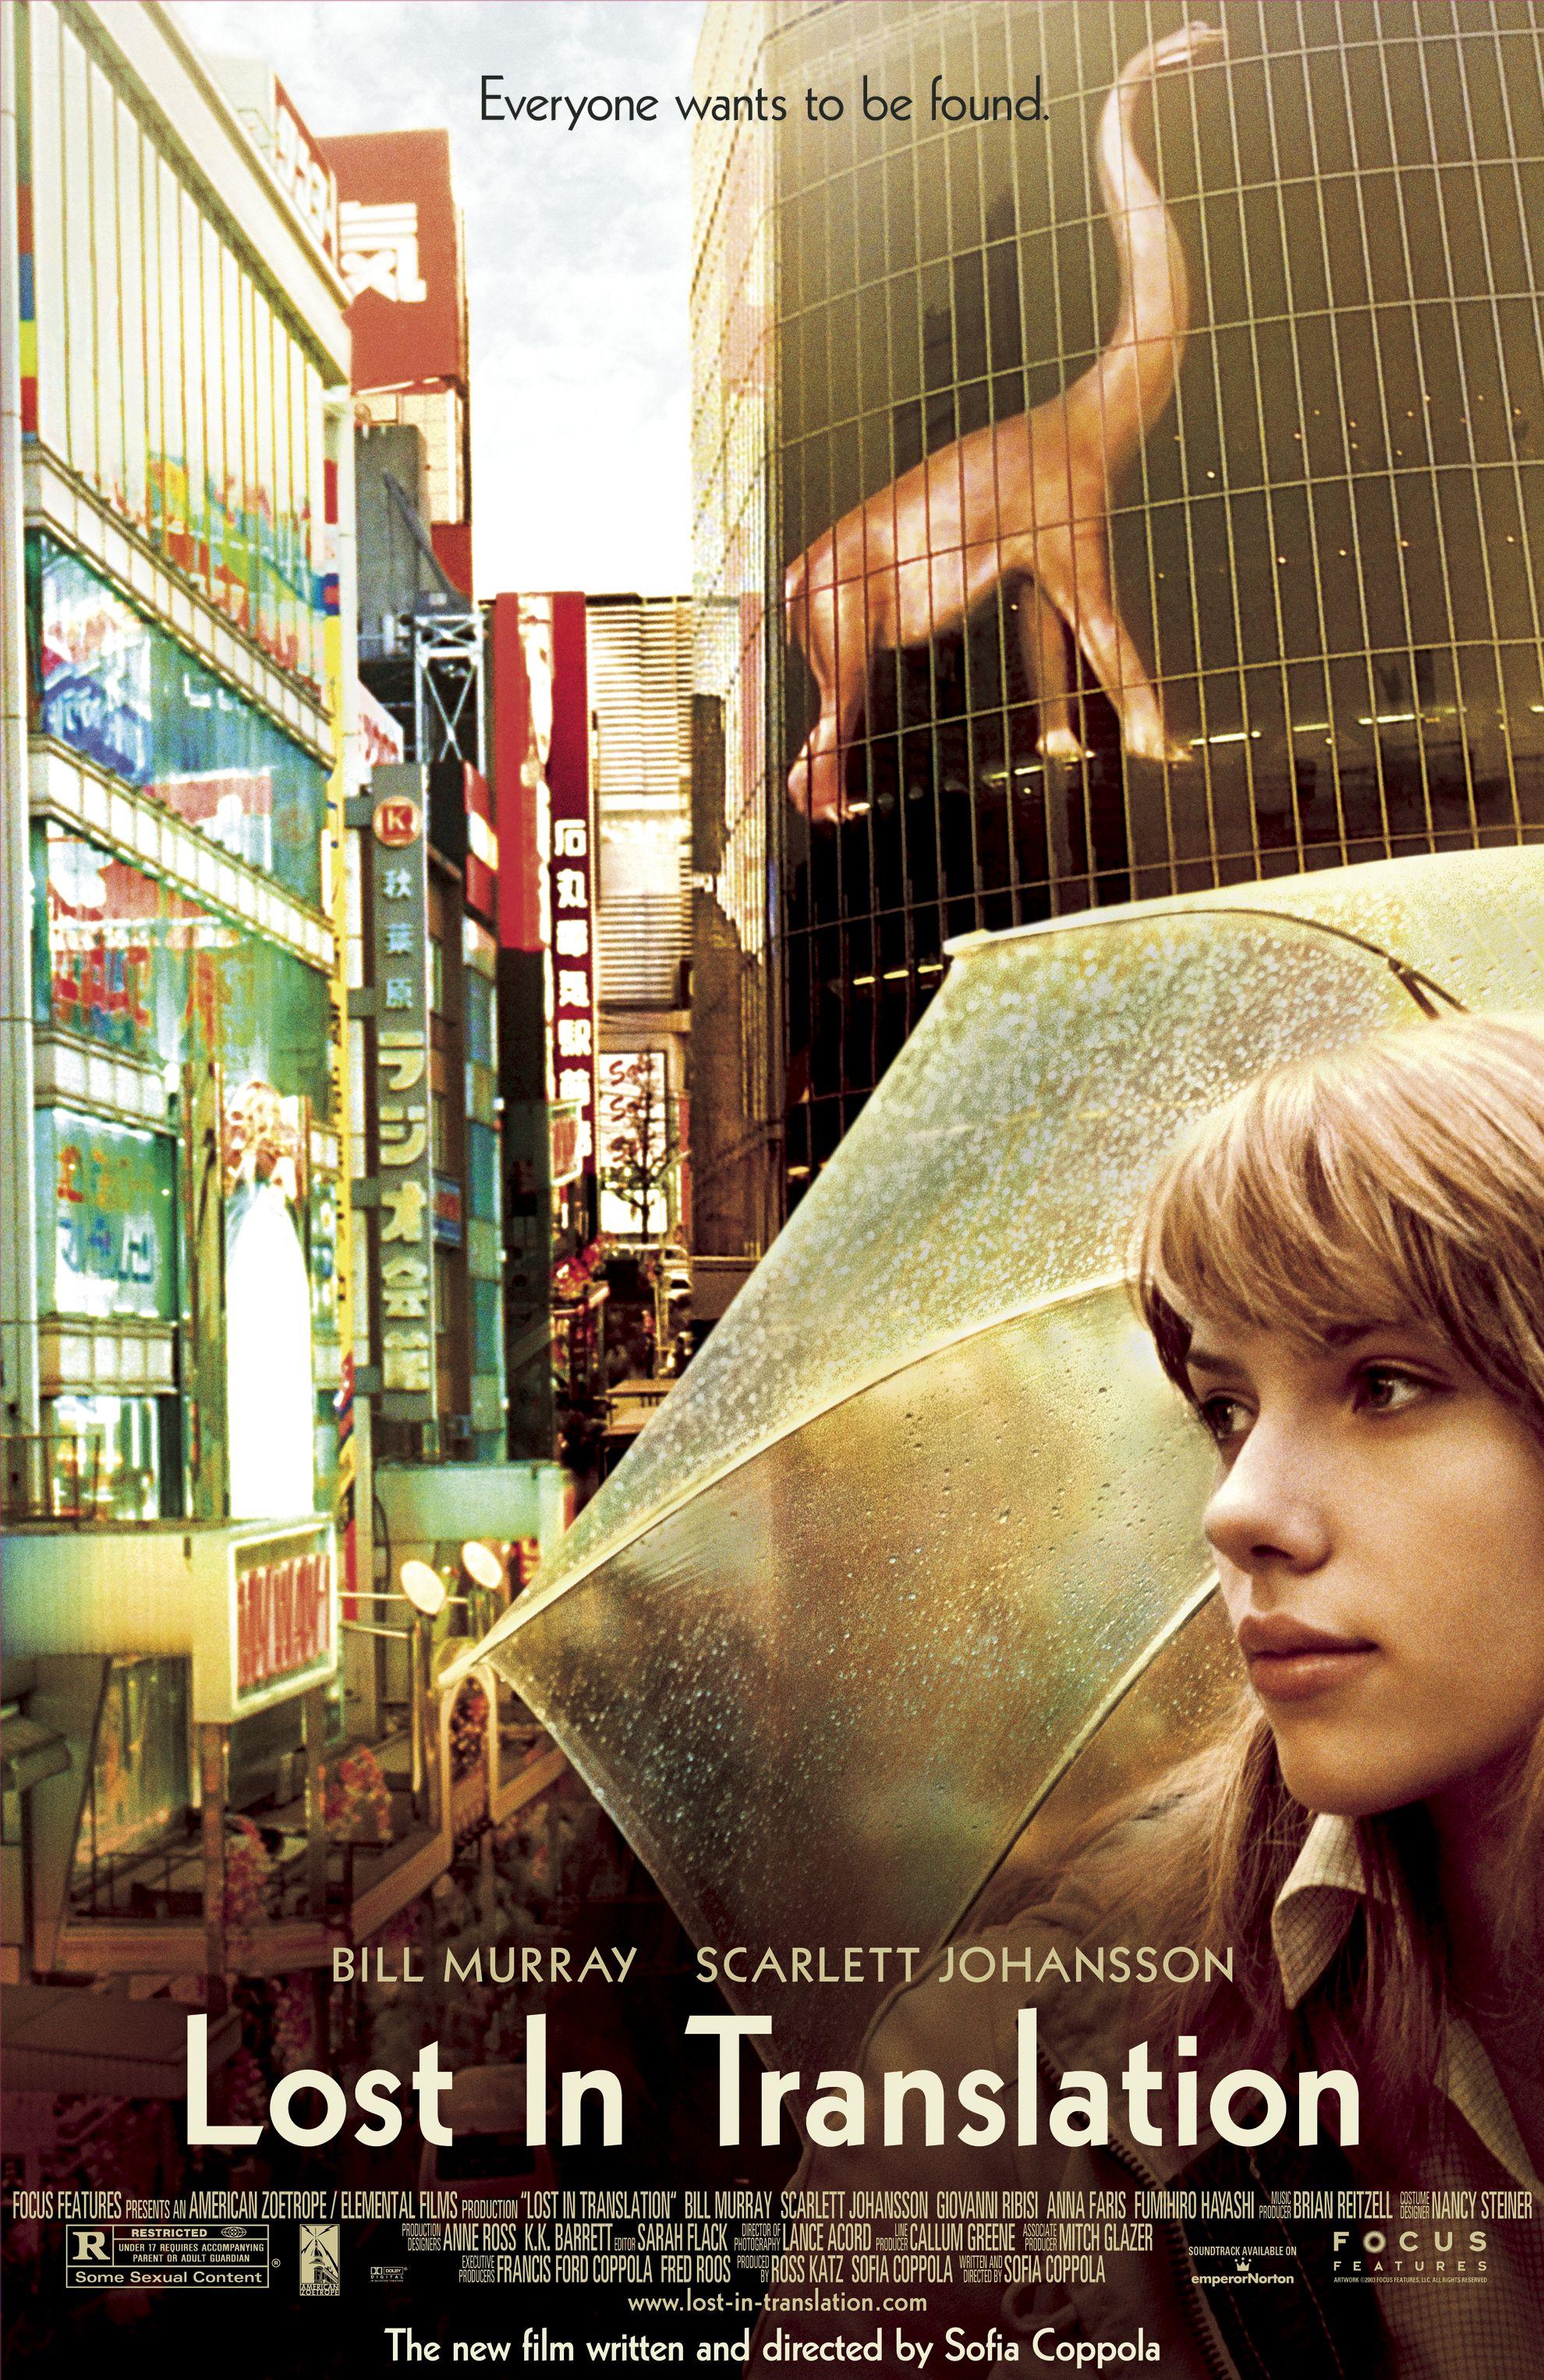 《爱情,不用翻译》(Lost in Translation)。图片来源:IMDb